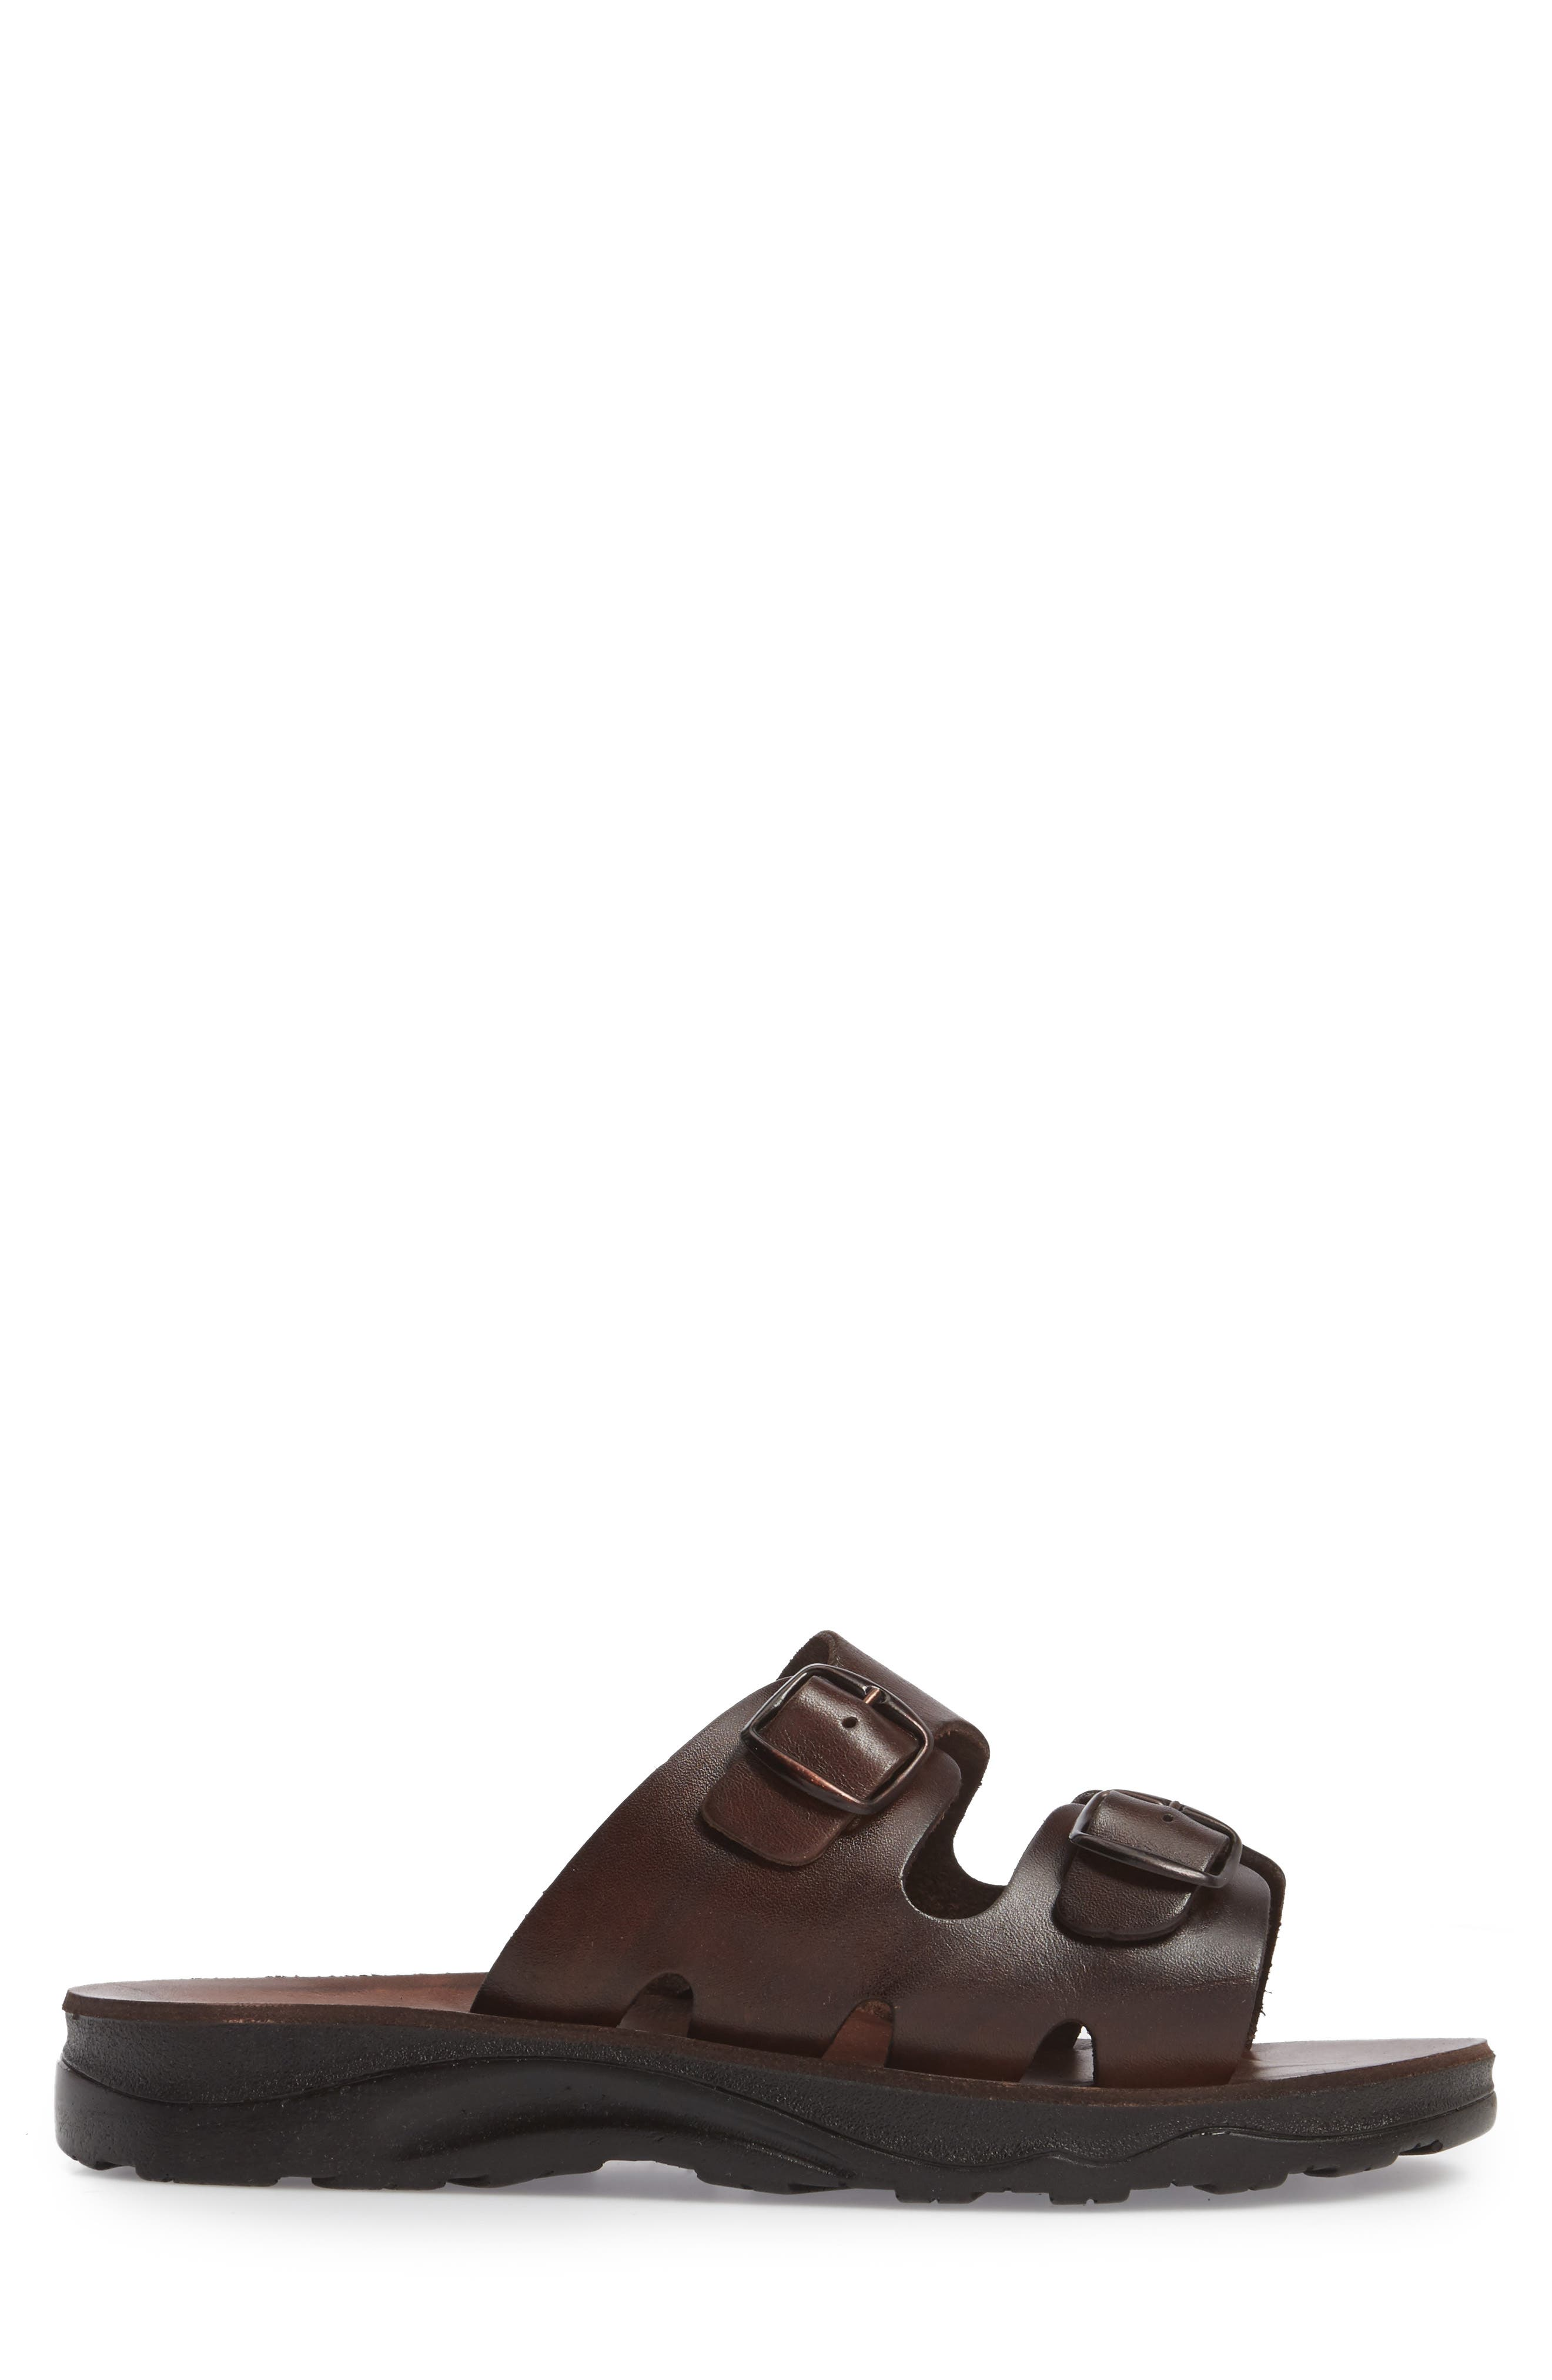 Barnabas Sandal,                             Alternate thumbnail 3, color,                             Brown Leather